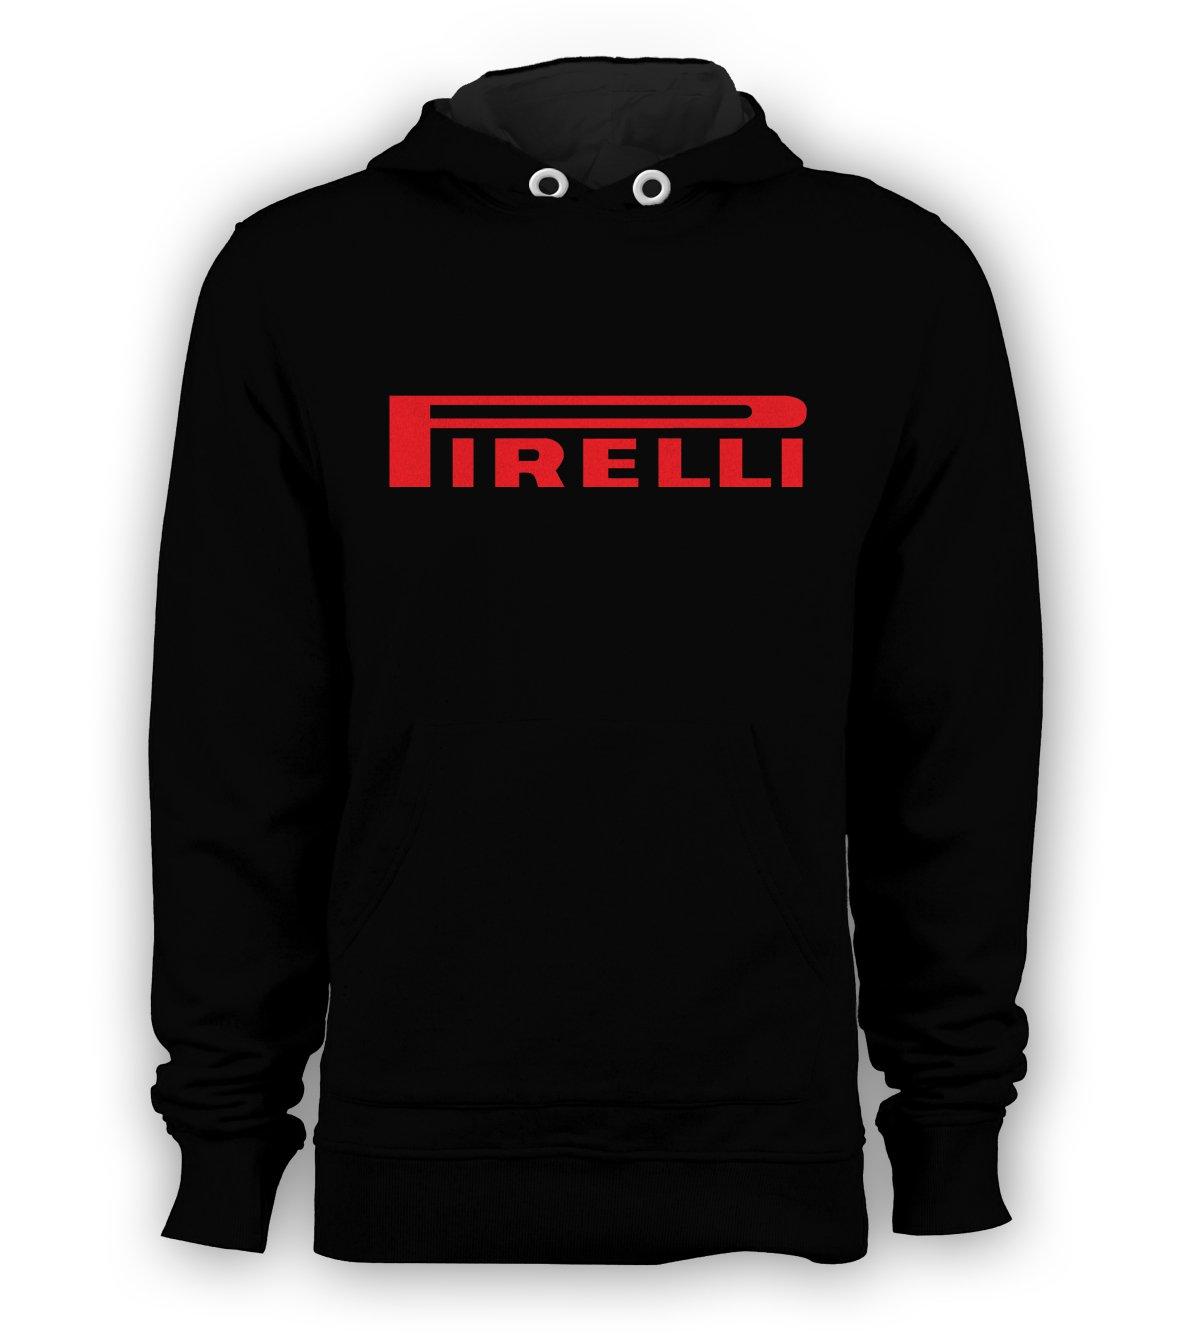 Pirelli Tyres Pullover Hoodie Men Sweatshirts Size S to 3XL New Black